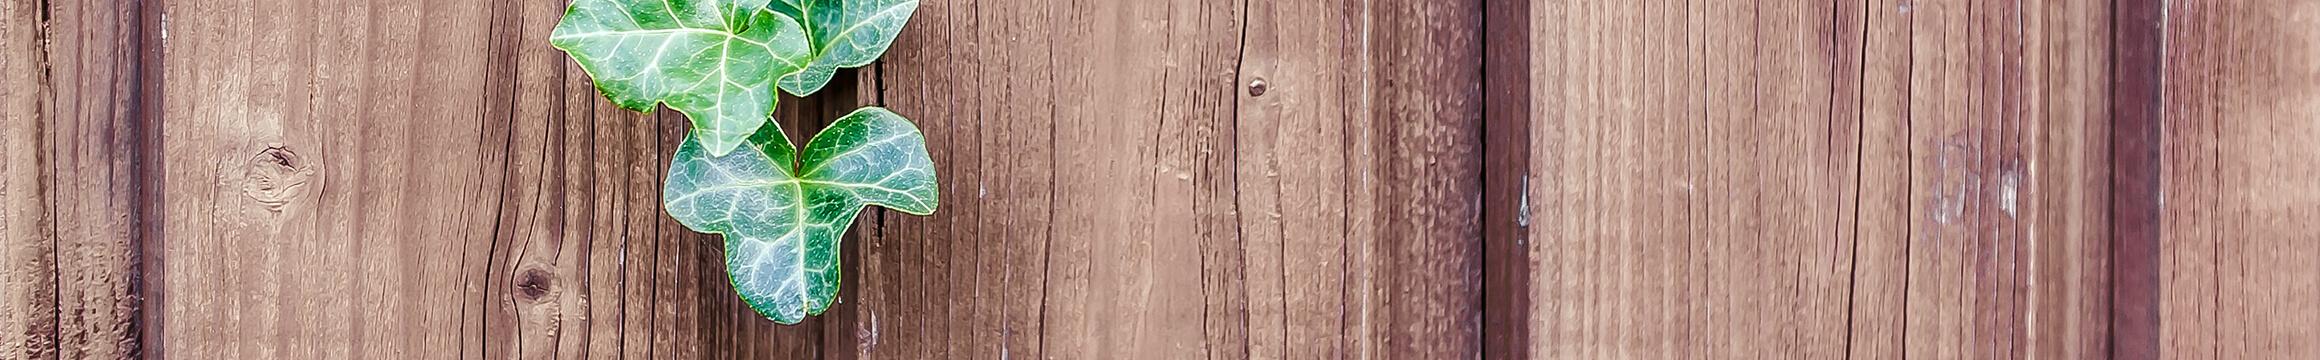 Wood Rustic 07